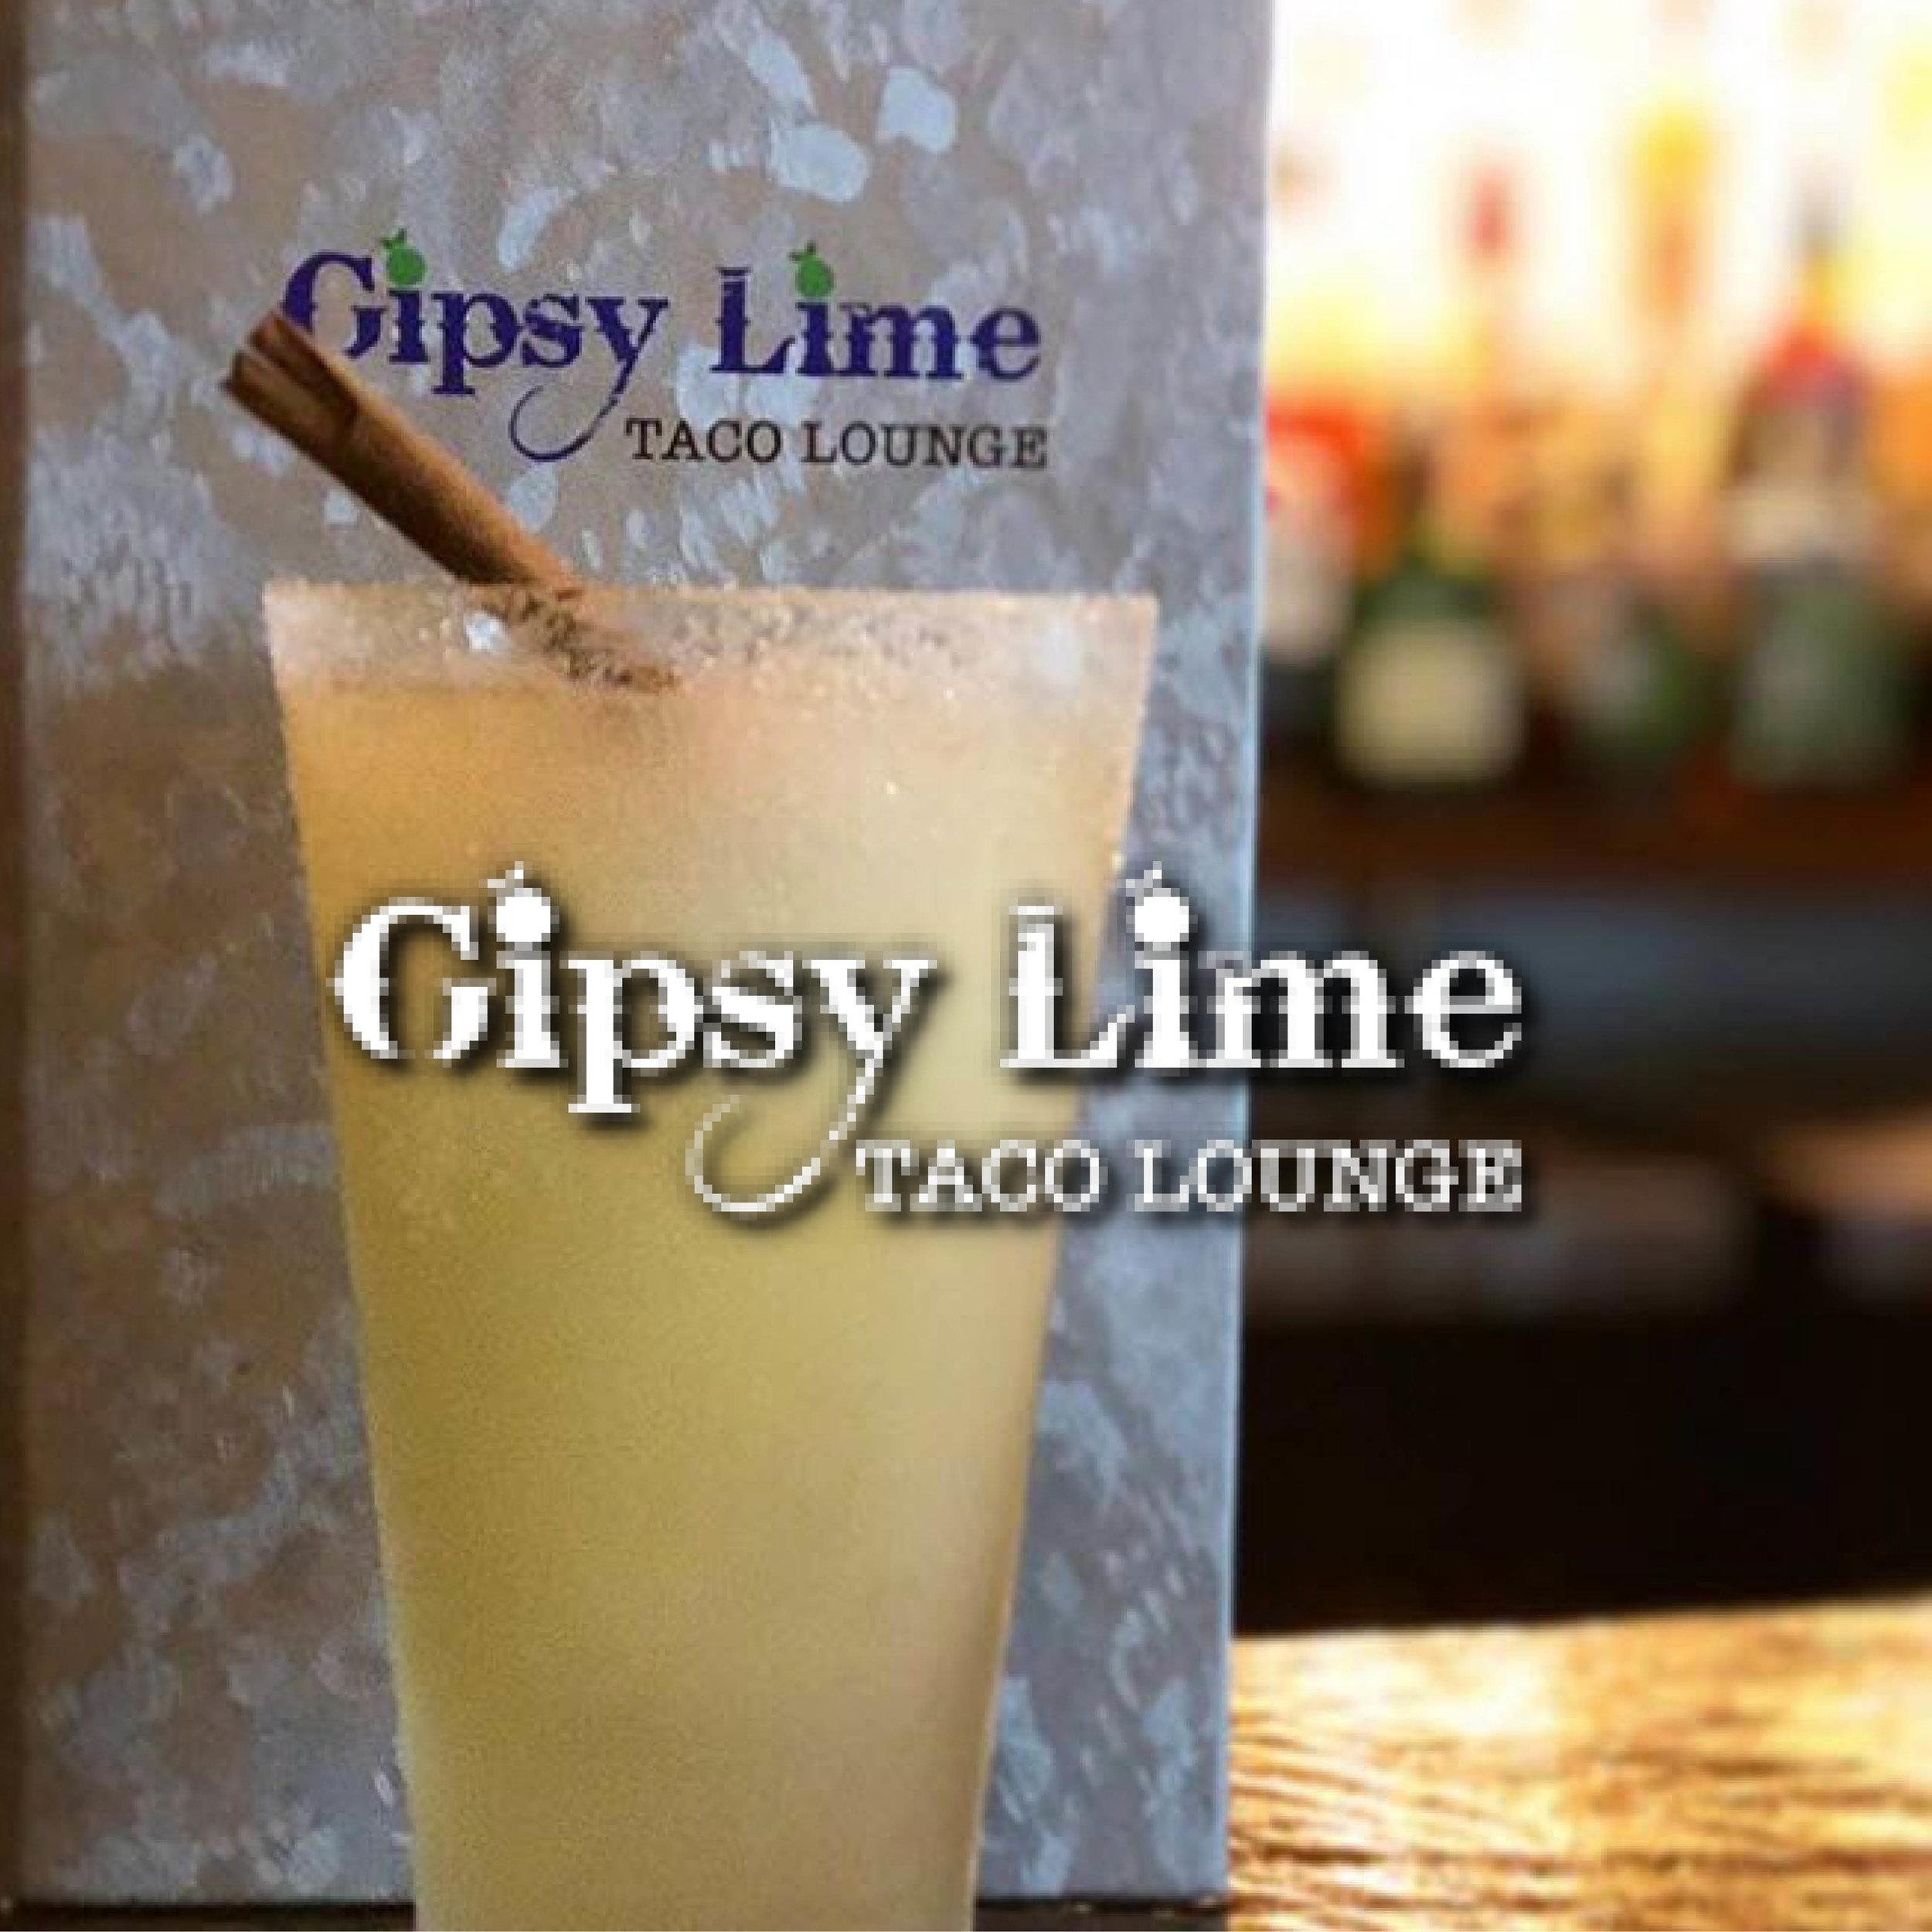 Taco Based Sports Lounge